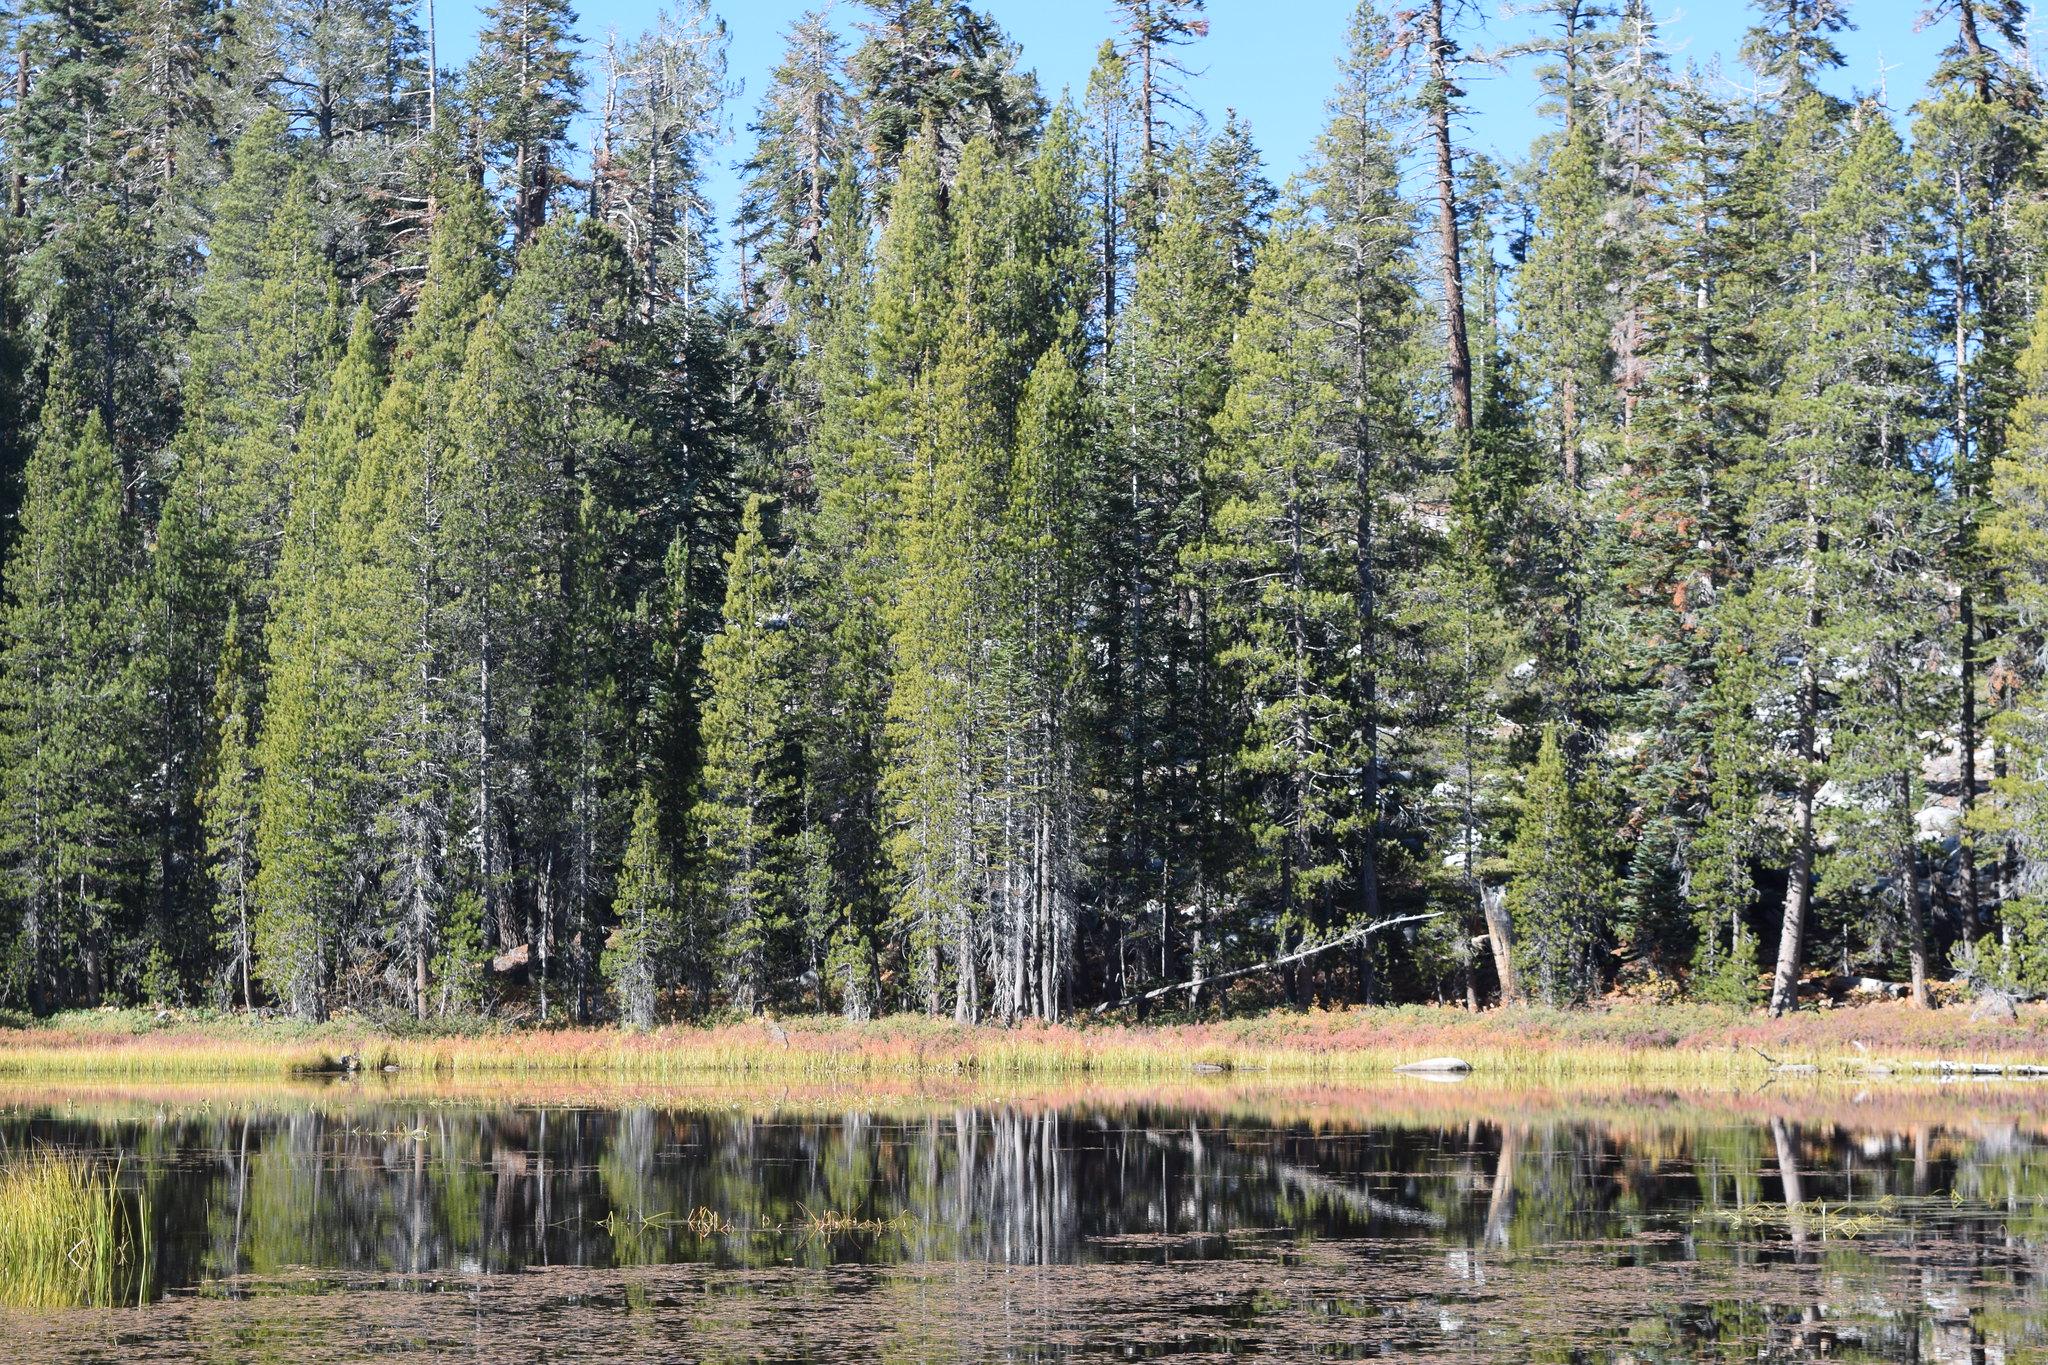 Yosemite National Park - The Tuolumne Meadows Road Alpine pond